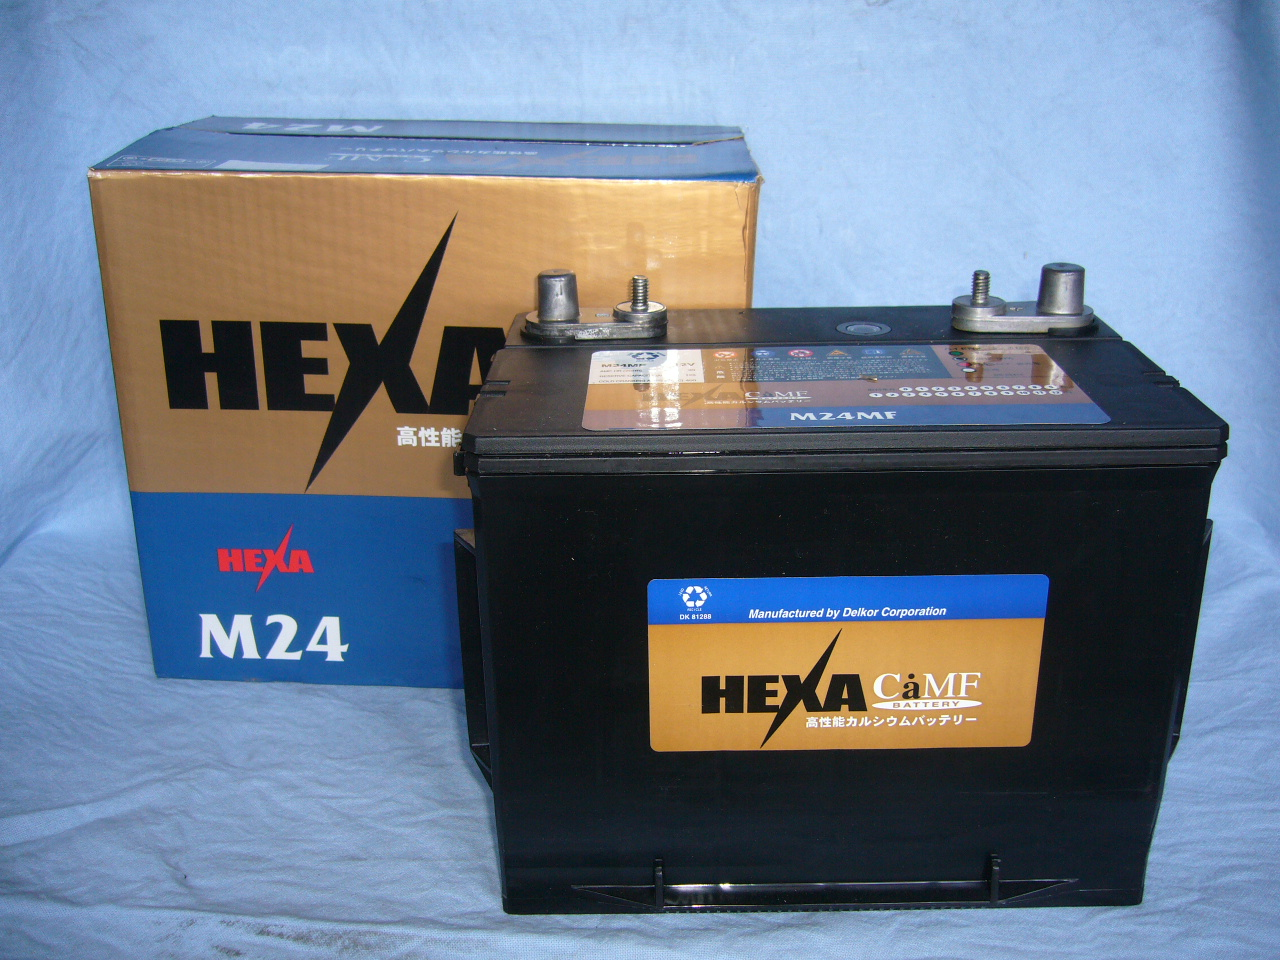 HEXAマリン用バッテリー ボートのエンジンの始動・キャンピングカーの電源に! M24MF/80Ah